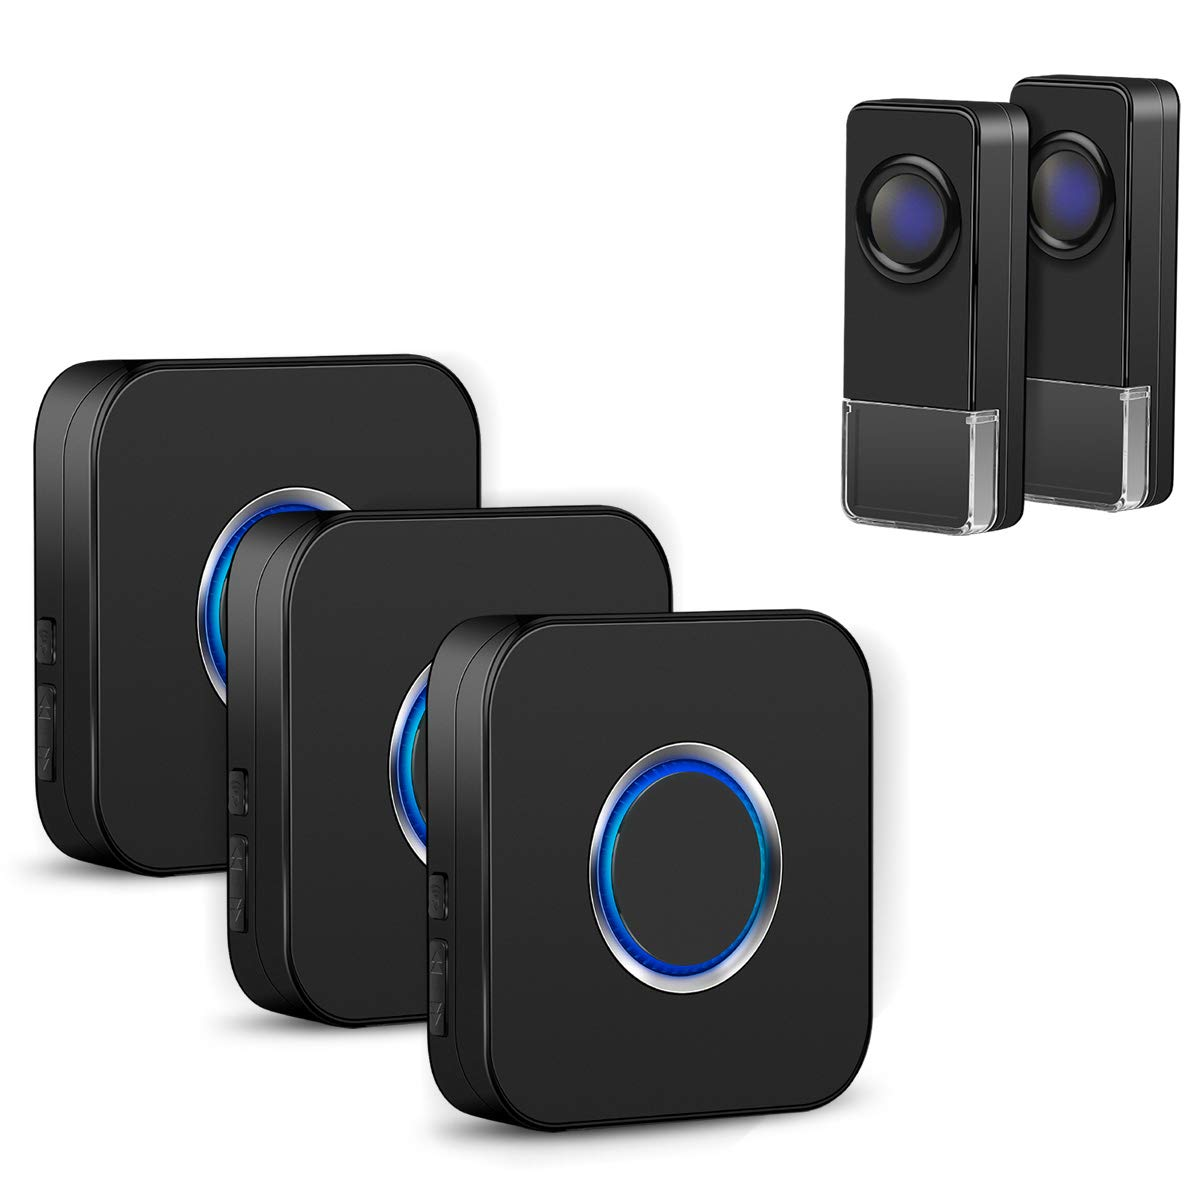 Coolqiya Doorbell Kit Wireless Door Bell Chimes with 3 Plugin Receivers and 2 Remote Waterproof Door Buttons, No Battery Required for Receivers, 52 Ringtones, Black